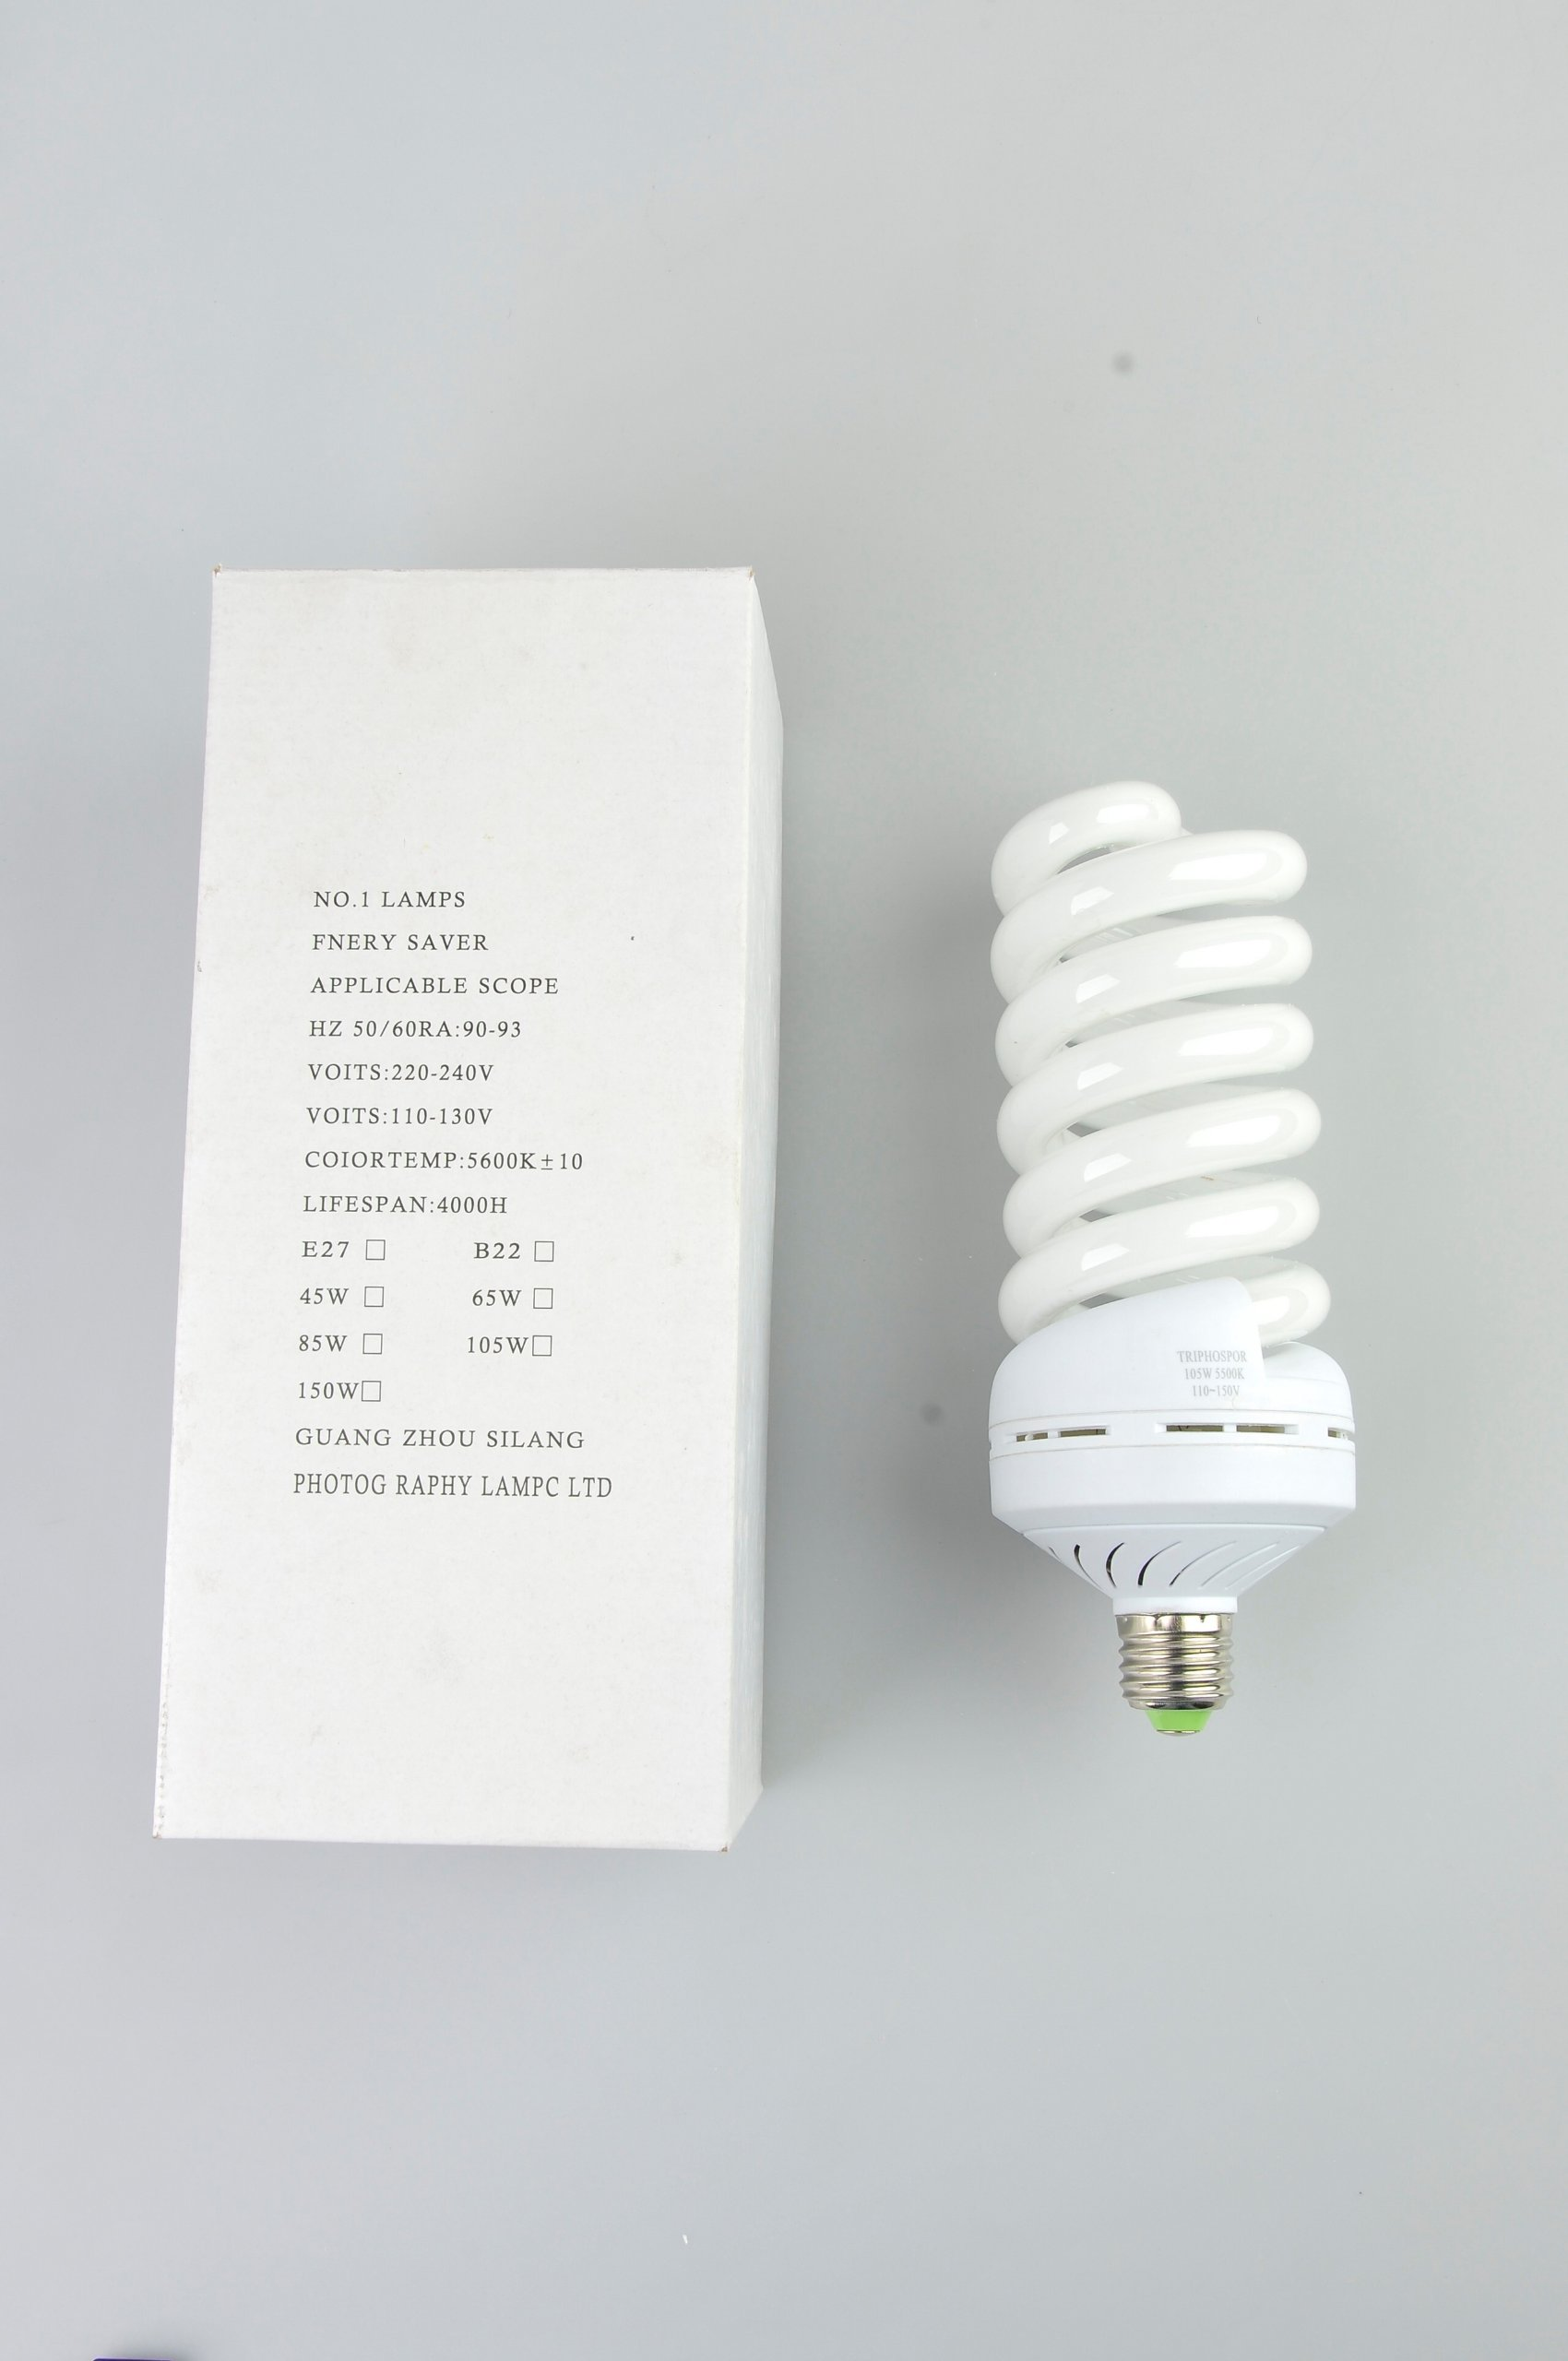 Neewer®Tri-Color Tube 105 Watt 5500 K (set of 5) Fluorescent Daylight Balanced Full Spectrum Light Bulb for Photography and Video Lighting (5 Pieces 105 Watt)